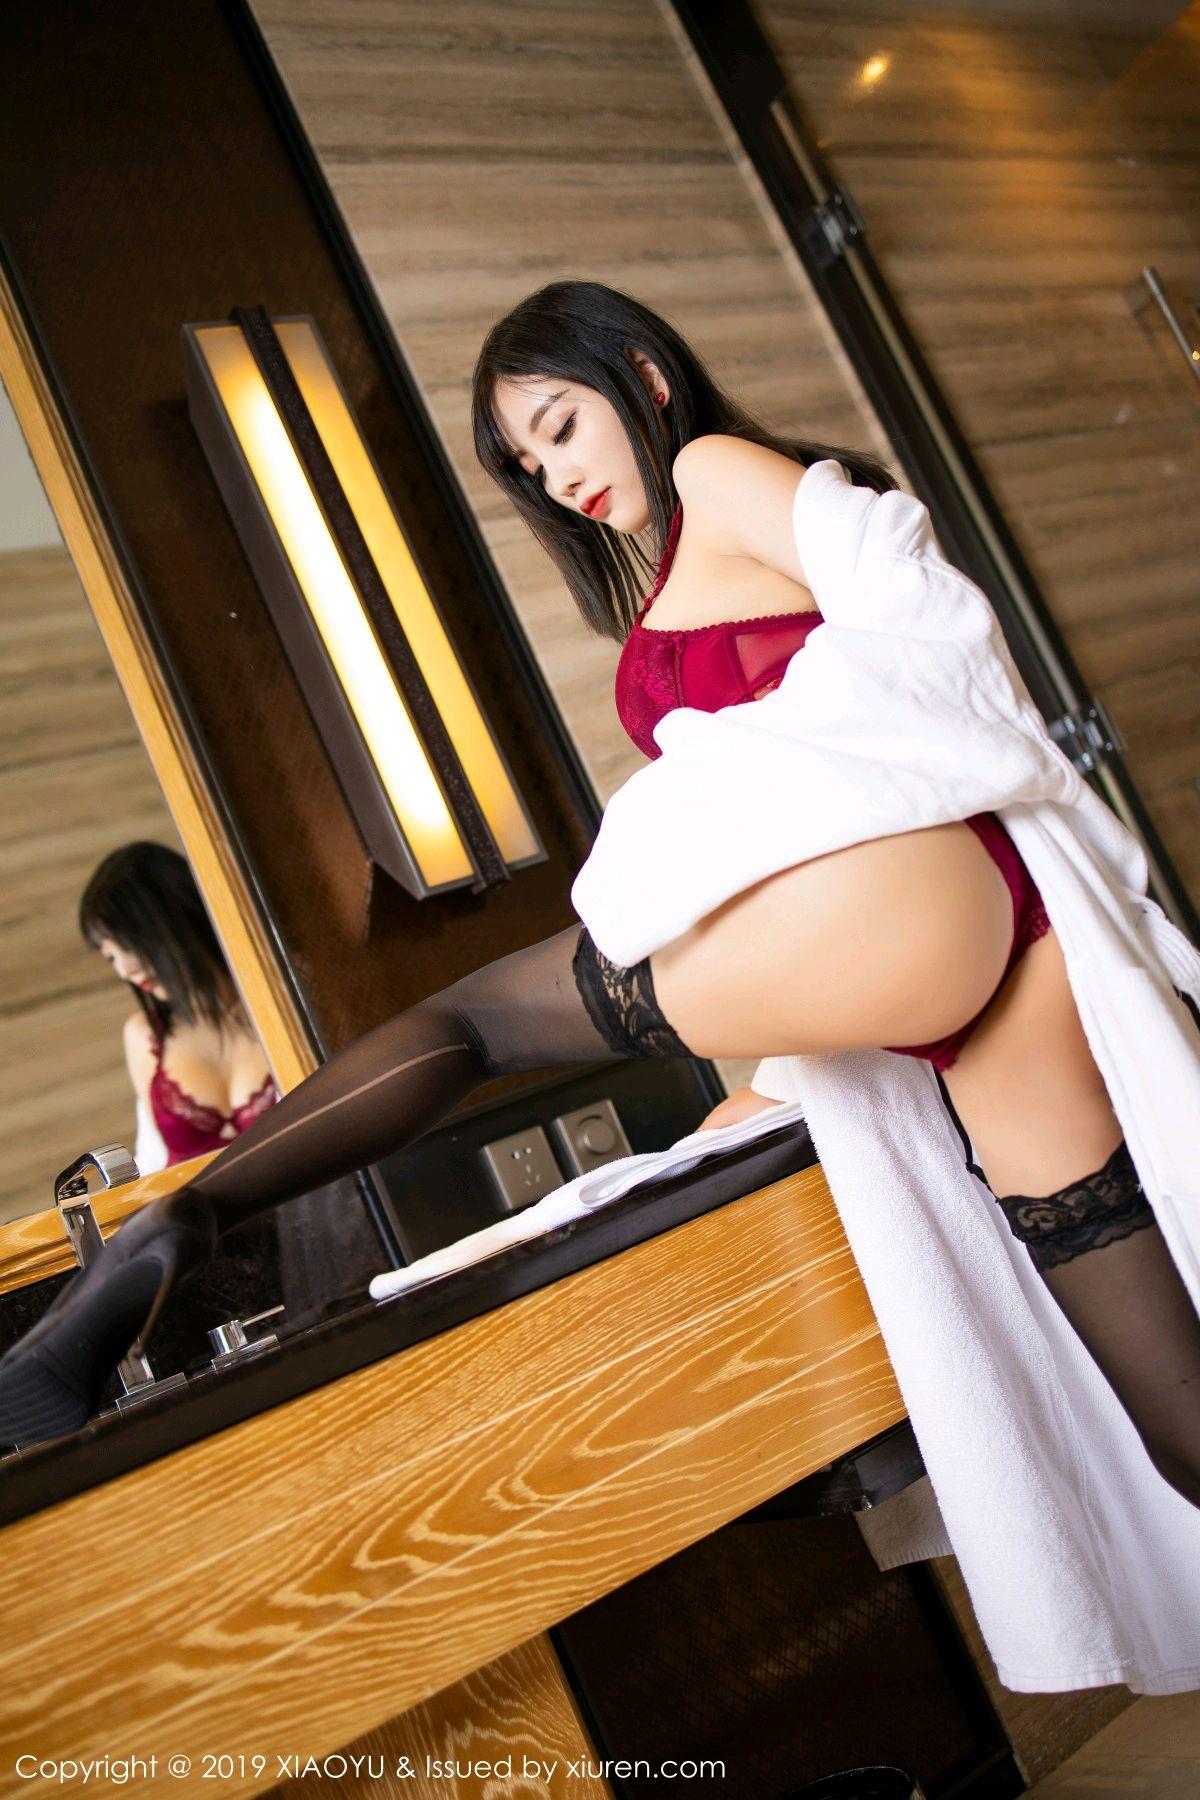 [XiaoYu] Vol.153 Yang Chen Chen 20P, Bathroom, Black Silk, Underwear, XiaoYu, Yang Chen Chen